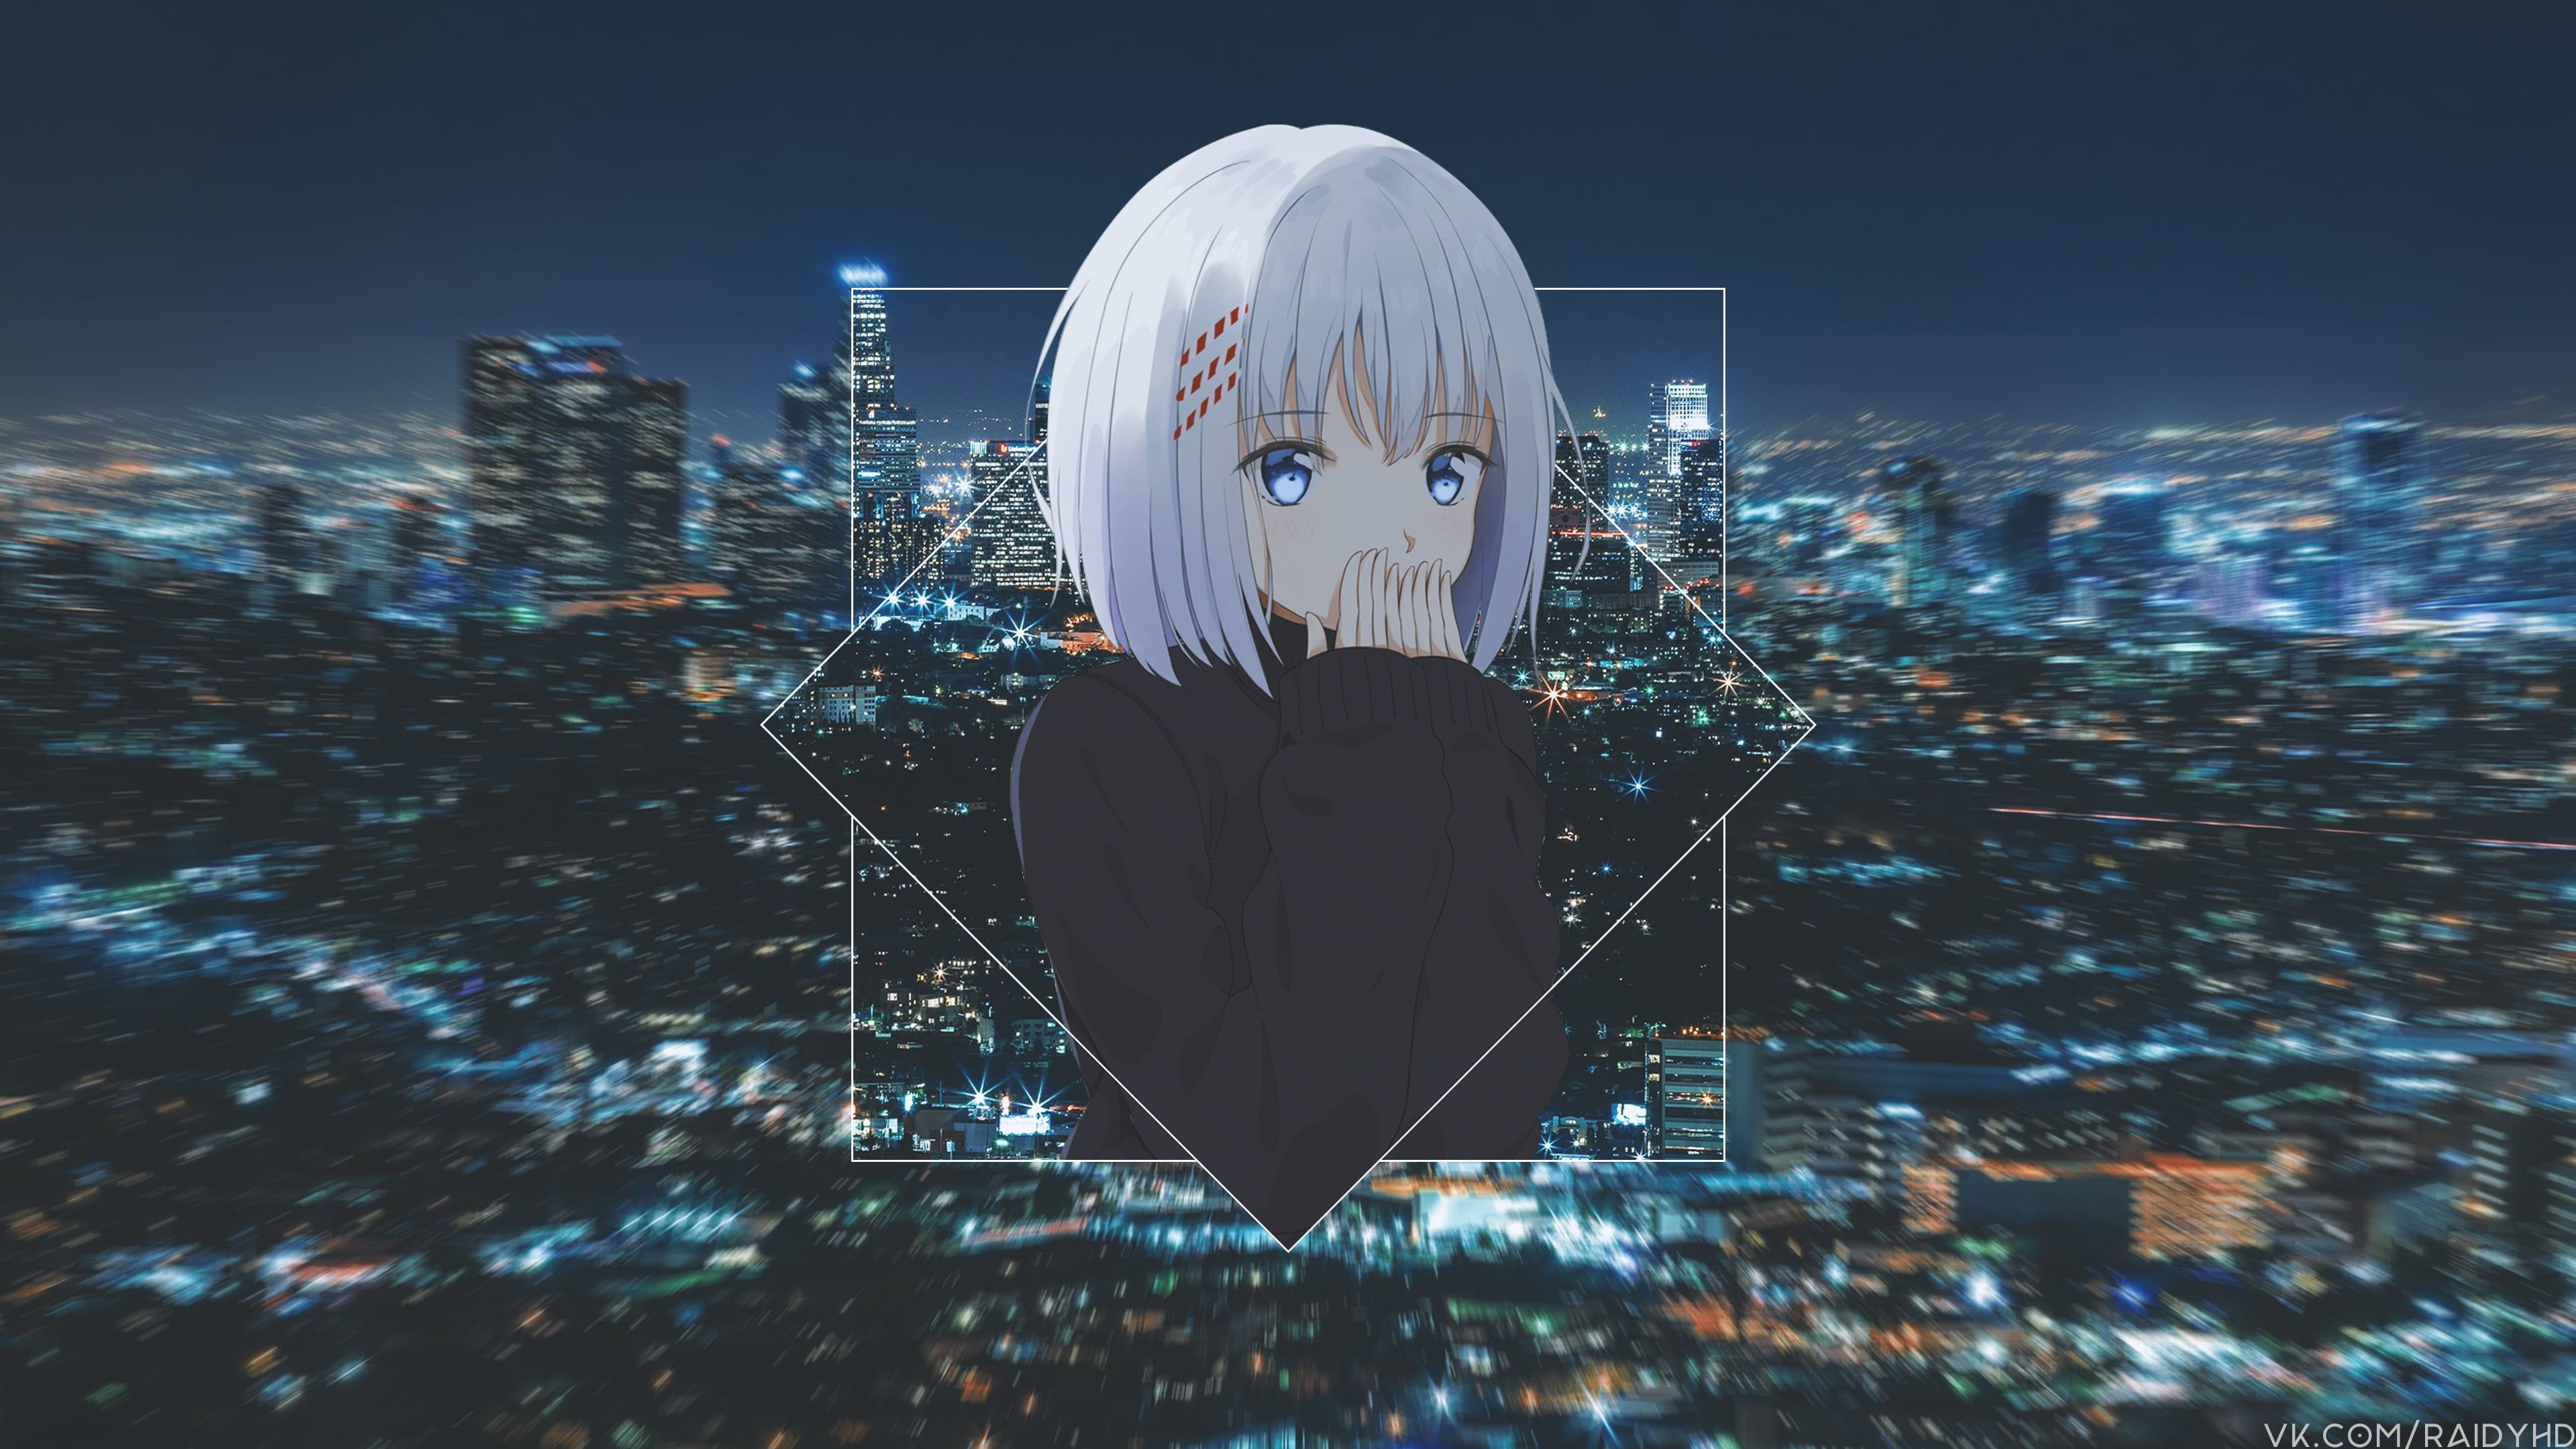 Tobiichi Origami Anime Girls Anime Picture In Picture 4k Wallpaper Hdwallpaper Desktop Hd Anime Wallpapers Wallpaper Pc Anime Anime Wallpaper